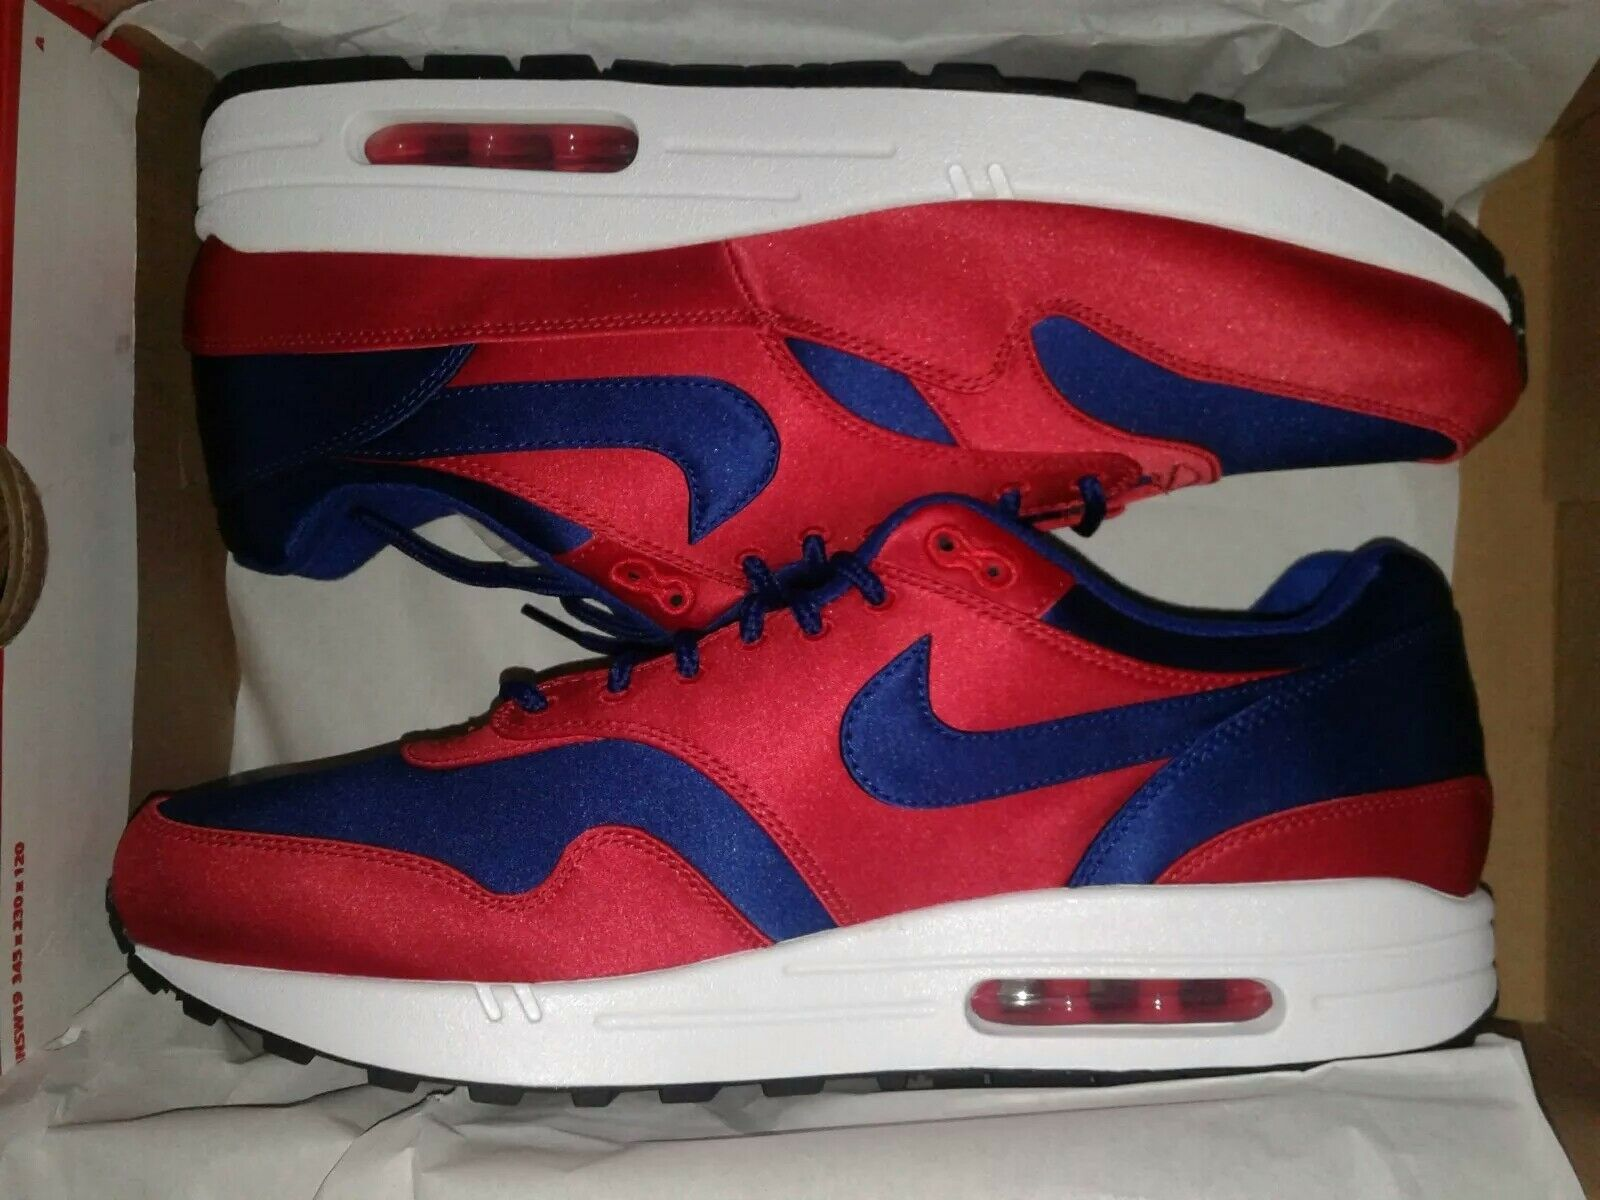 Nike Air Max 1 SE University Red Deep Royal blueee AO1021-600 Men's Size 11.5